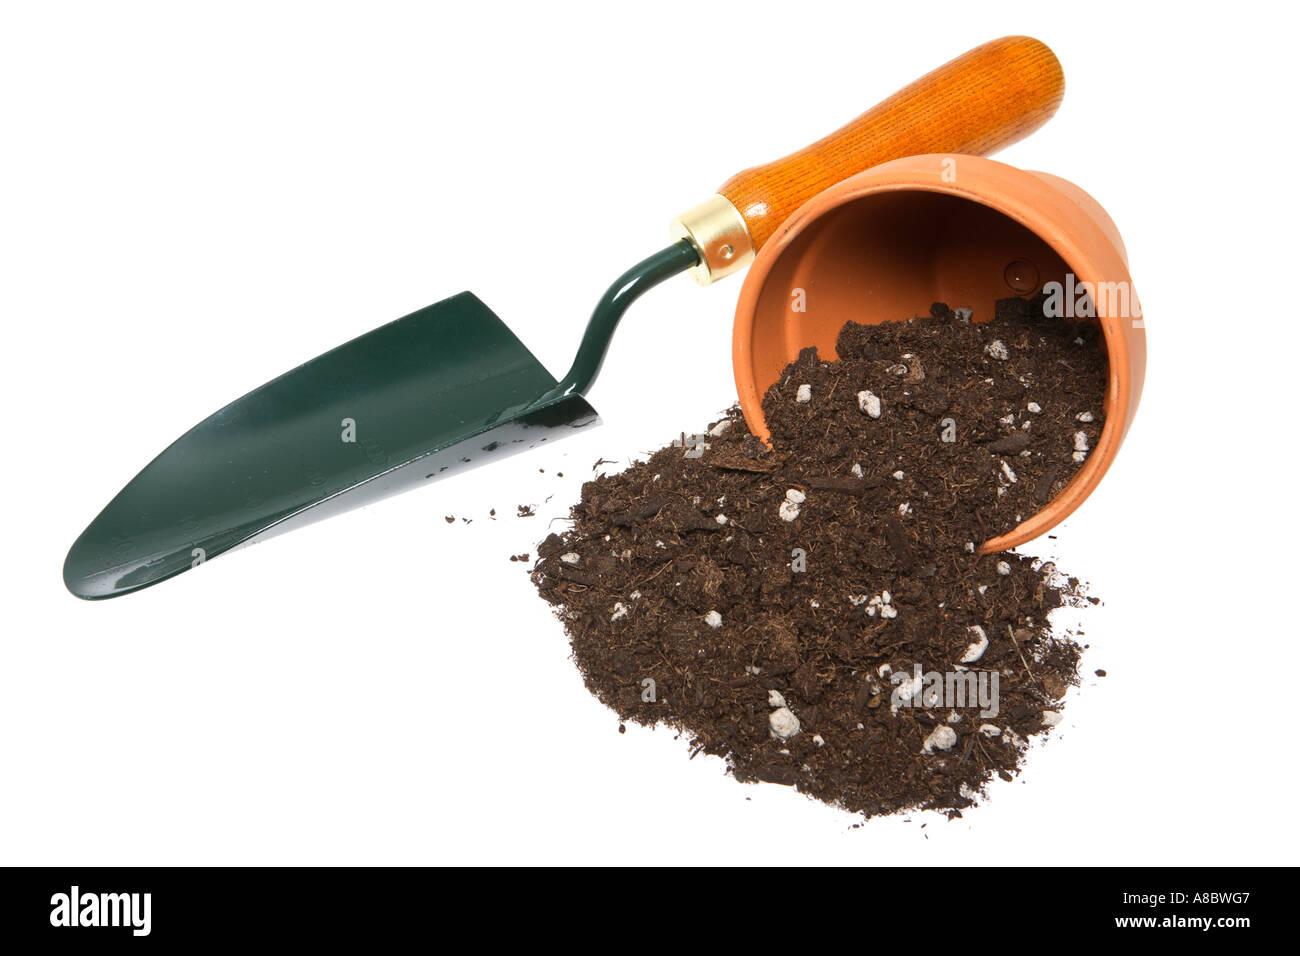 Potting Soil Garden Terra cotta pot with potting soil spilling out and garden shovel terra cotta pot with potting soil spilling out and garden shovel workwithnaturefo